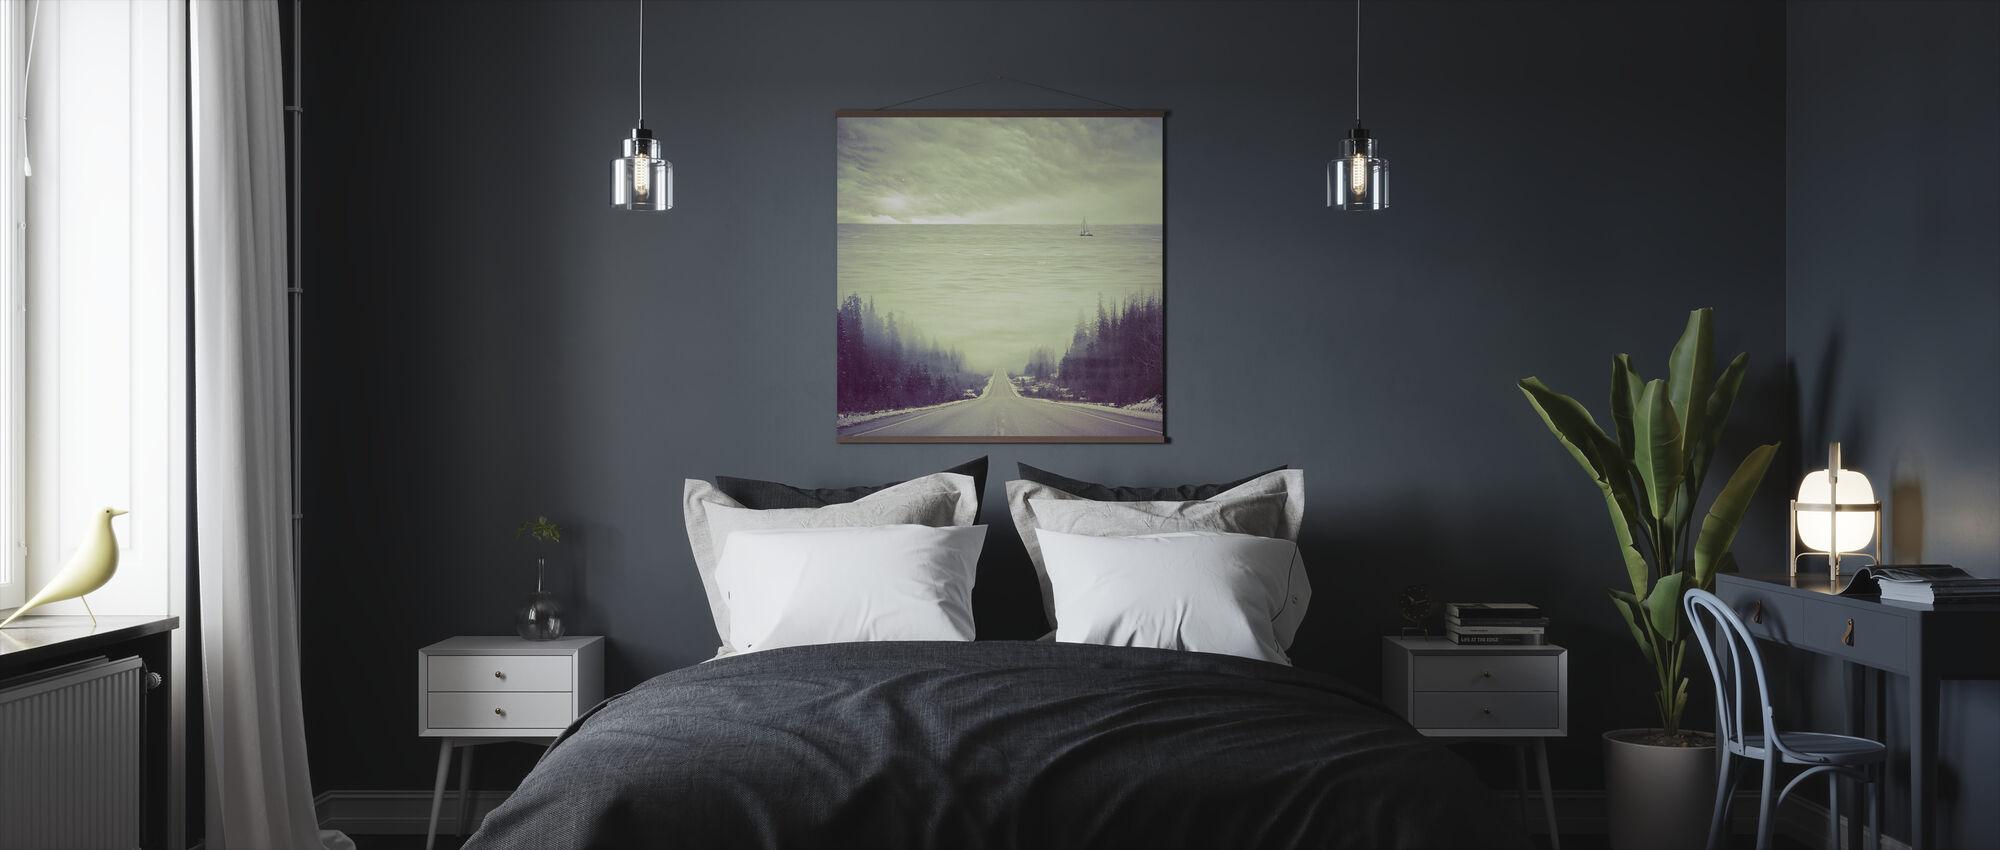 Dupcism - Poster - Bedroom